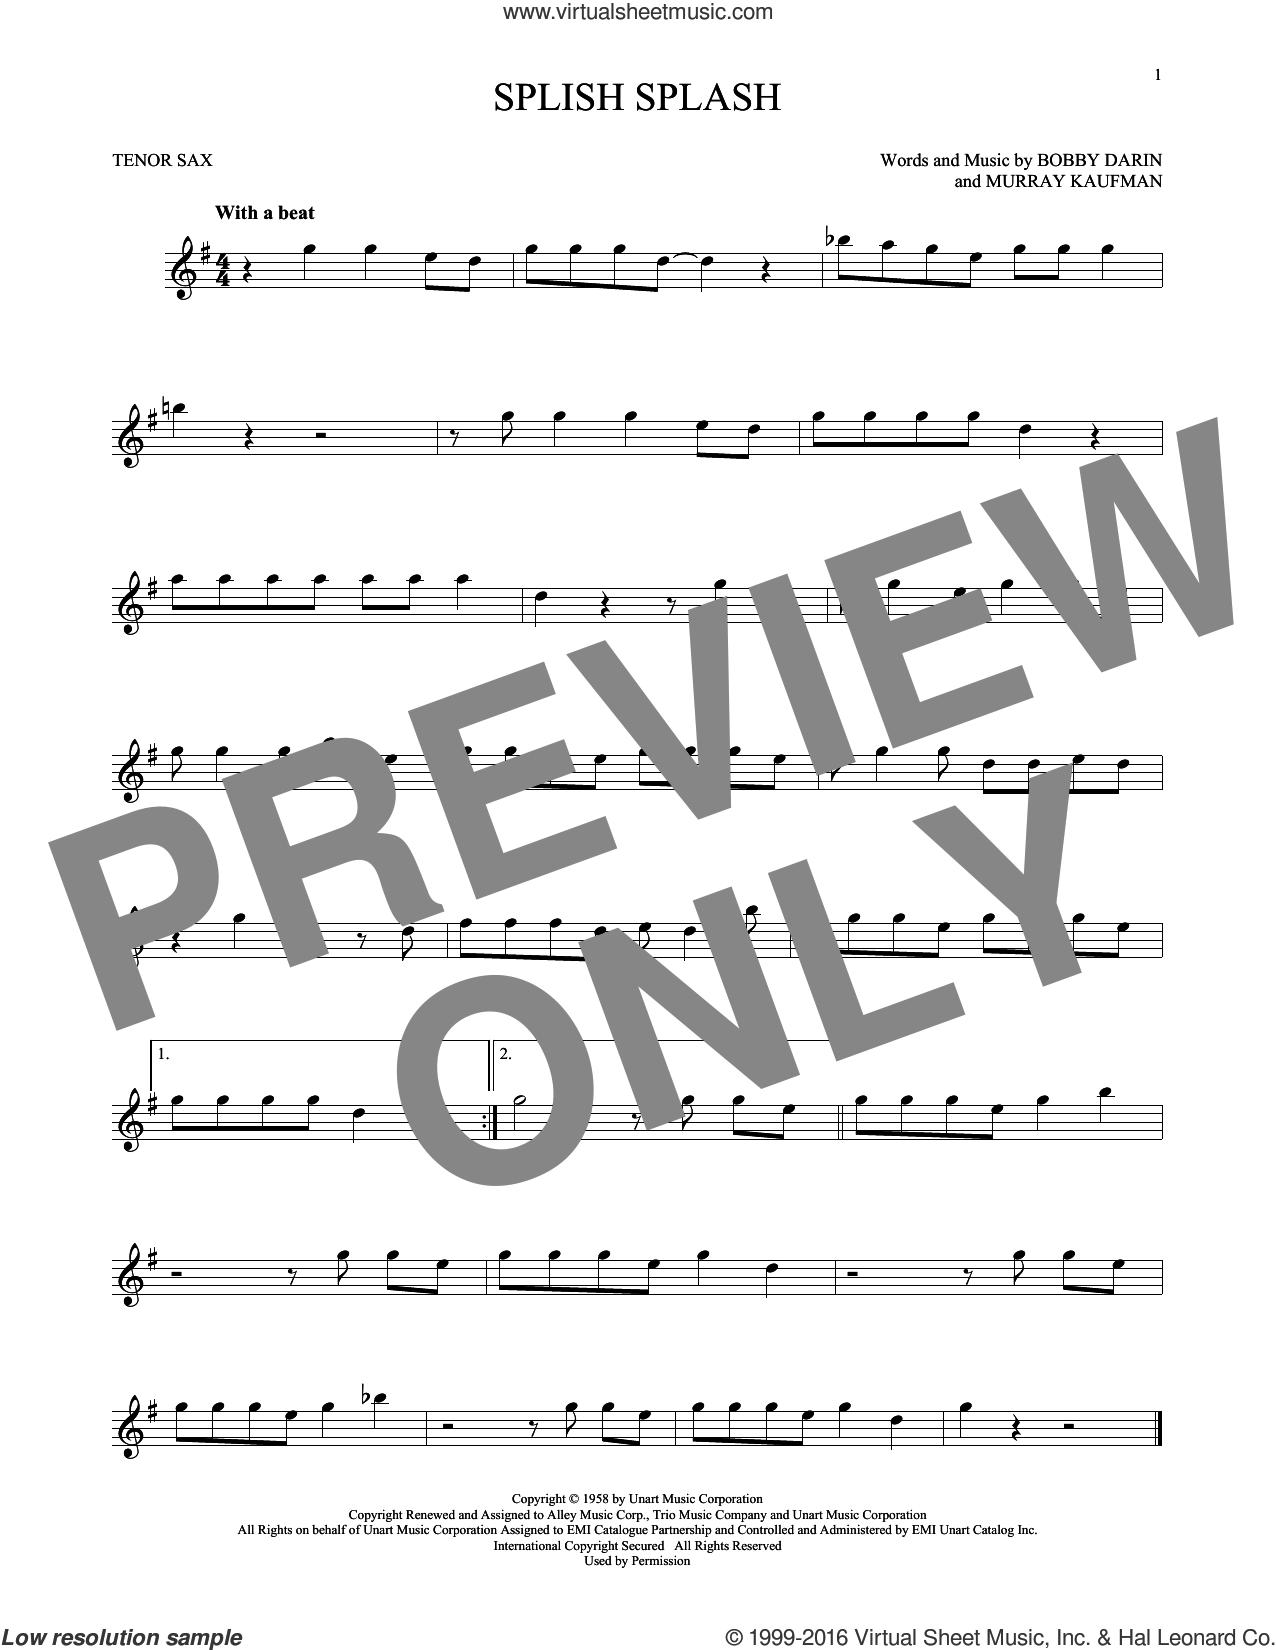 Splish Splash sheet music for tenor saxophone solo by Bobby Darin and Murray Kaufman, intermediate skill level